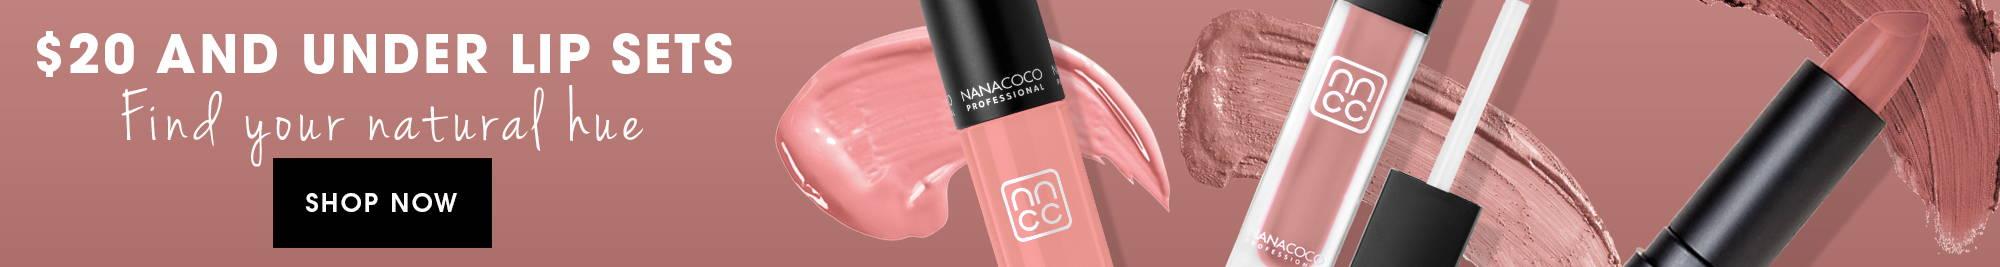 Nanacoco Professional$20 and under lip gloss, lipstick, lip creme, and lip crayon sets